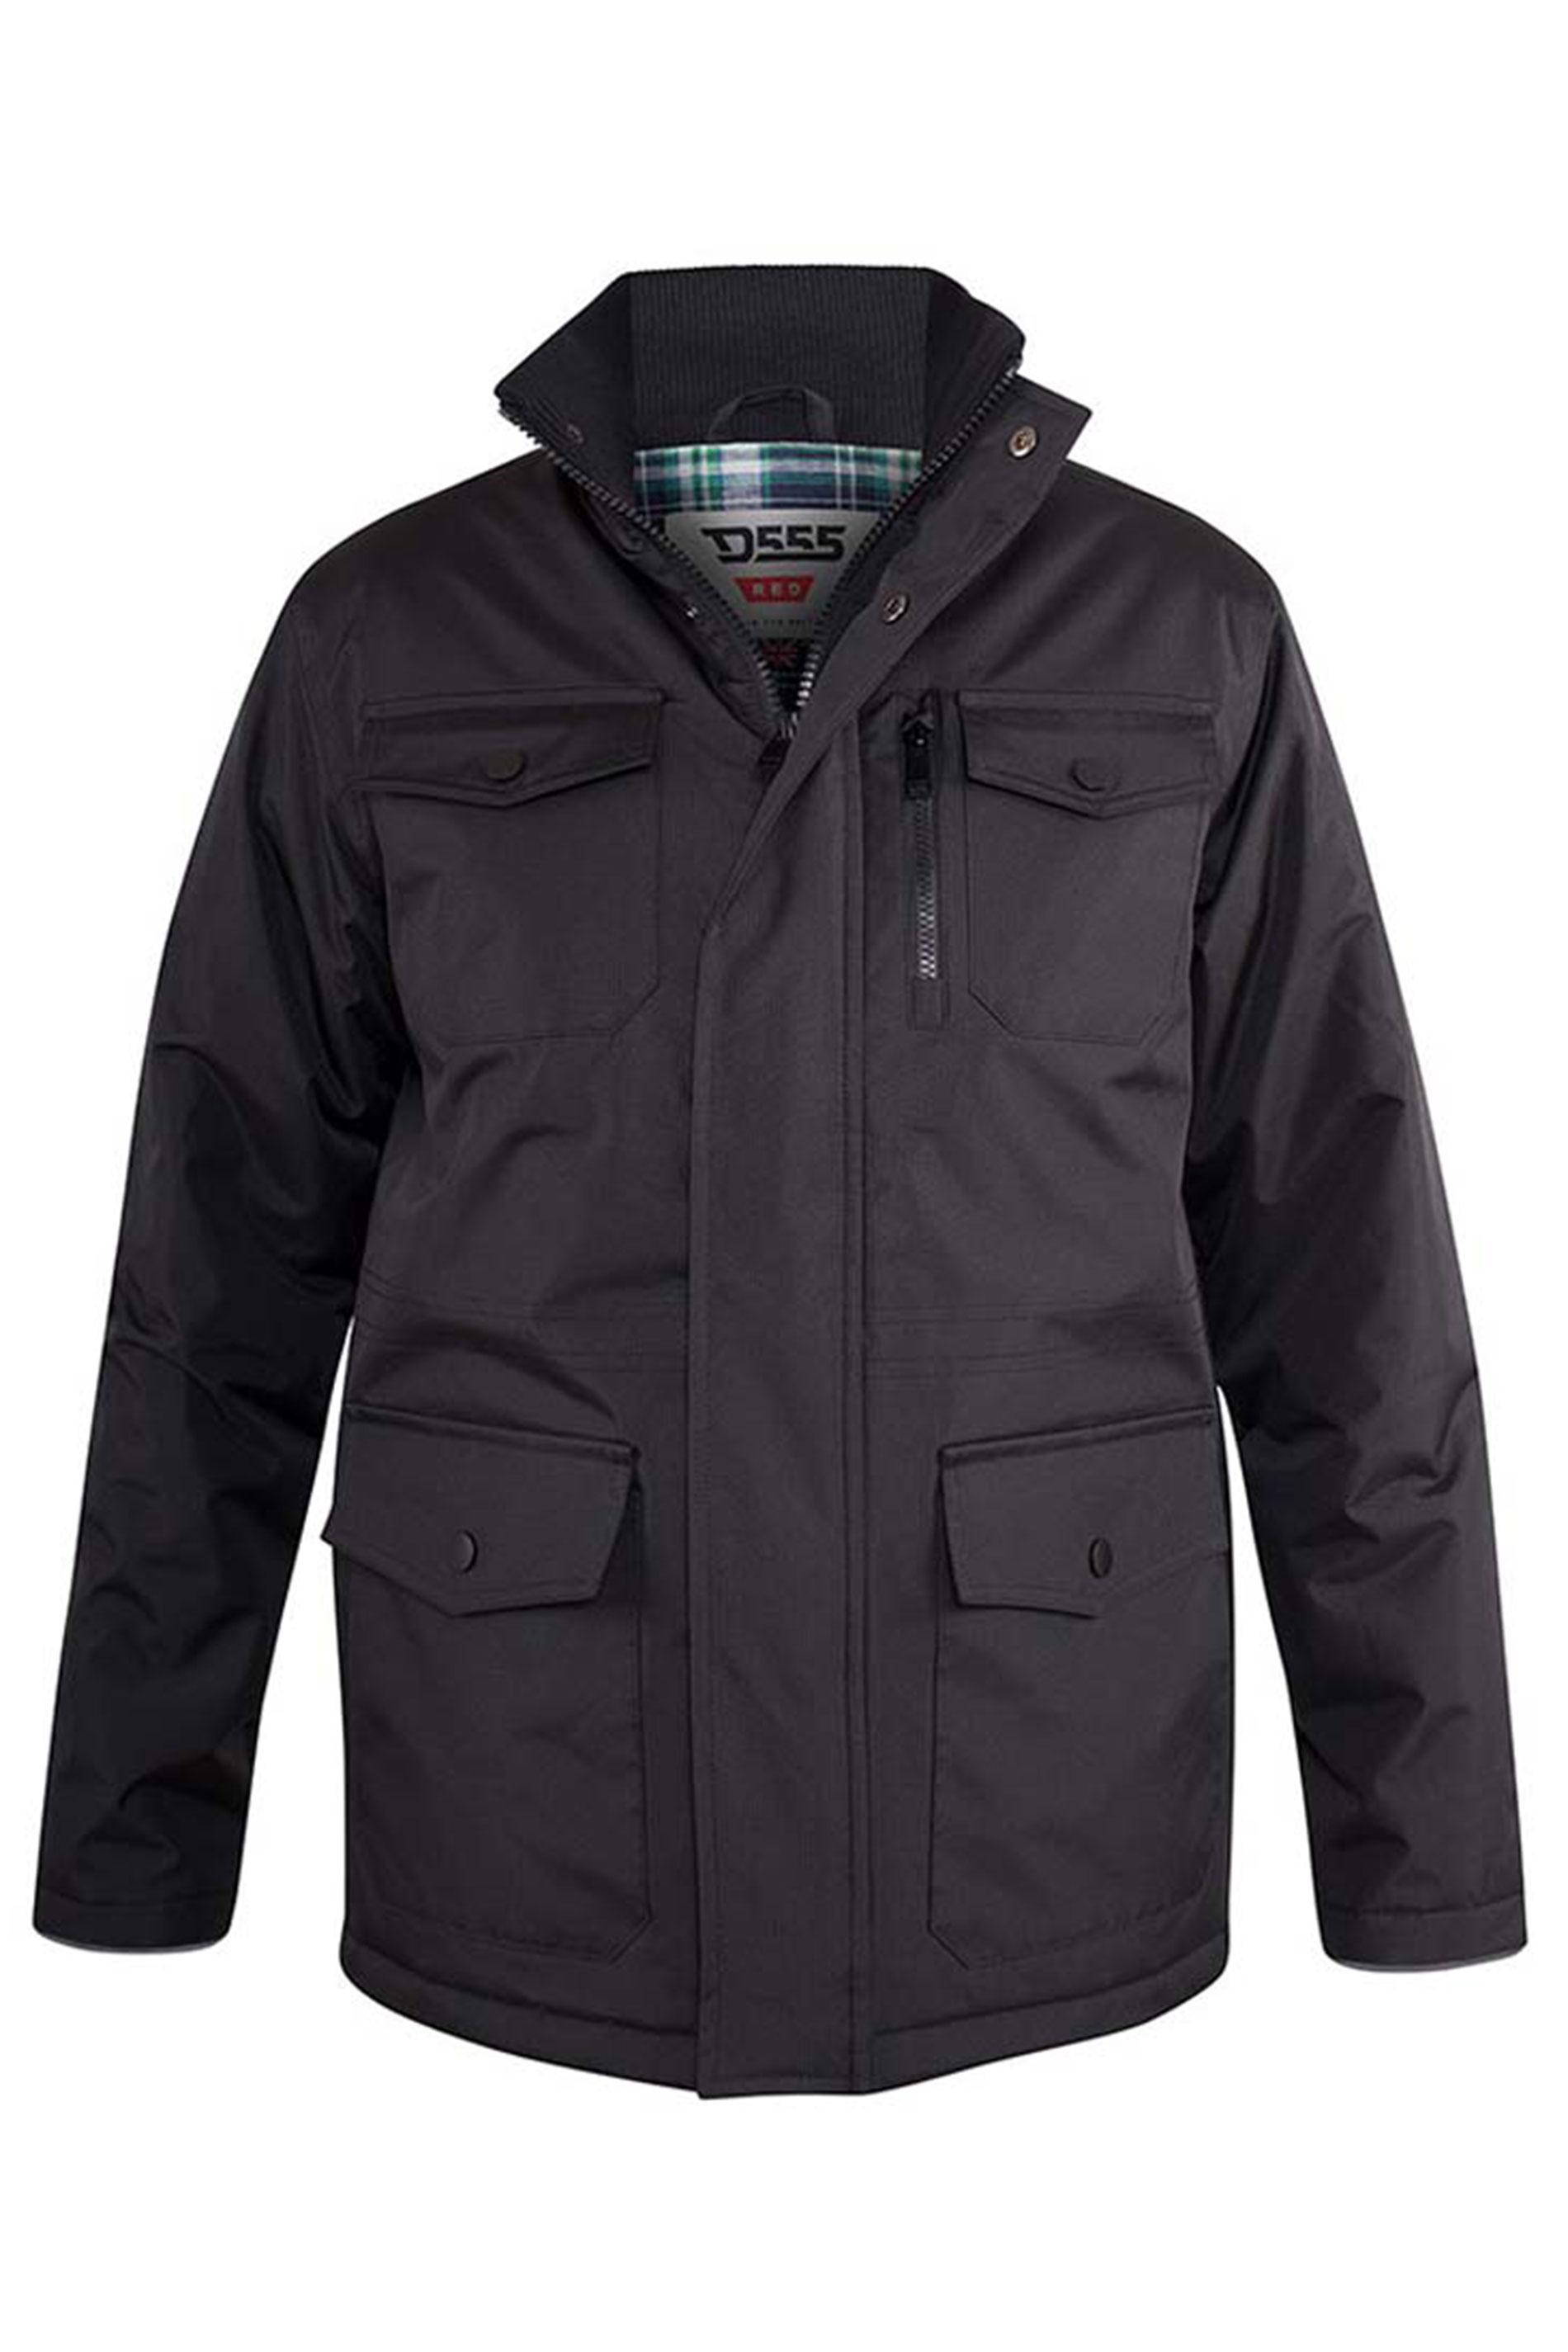 D555 Black Fargo Five Pocket Jacket